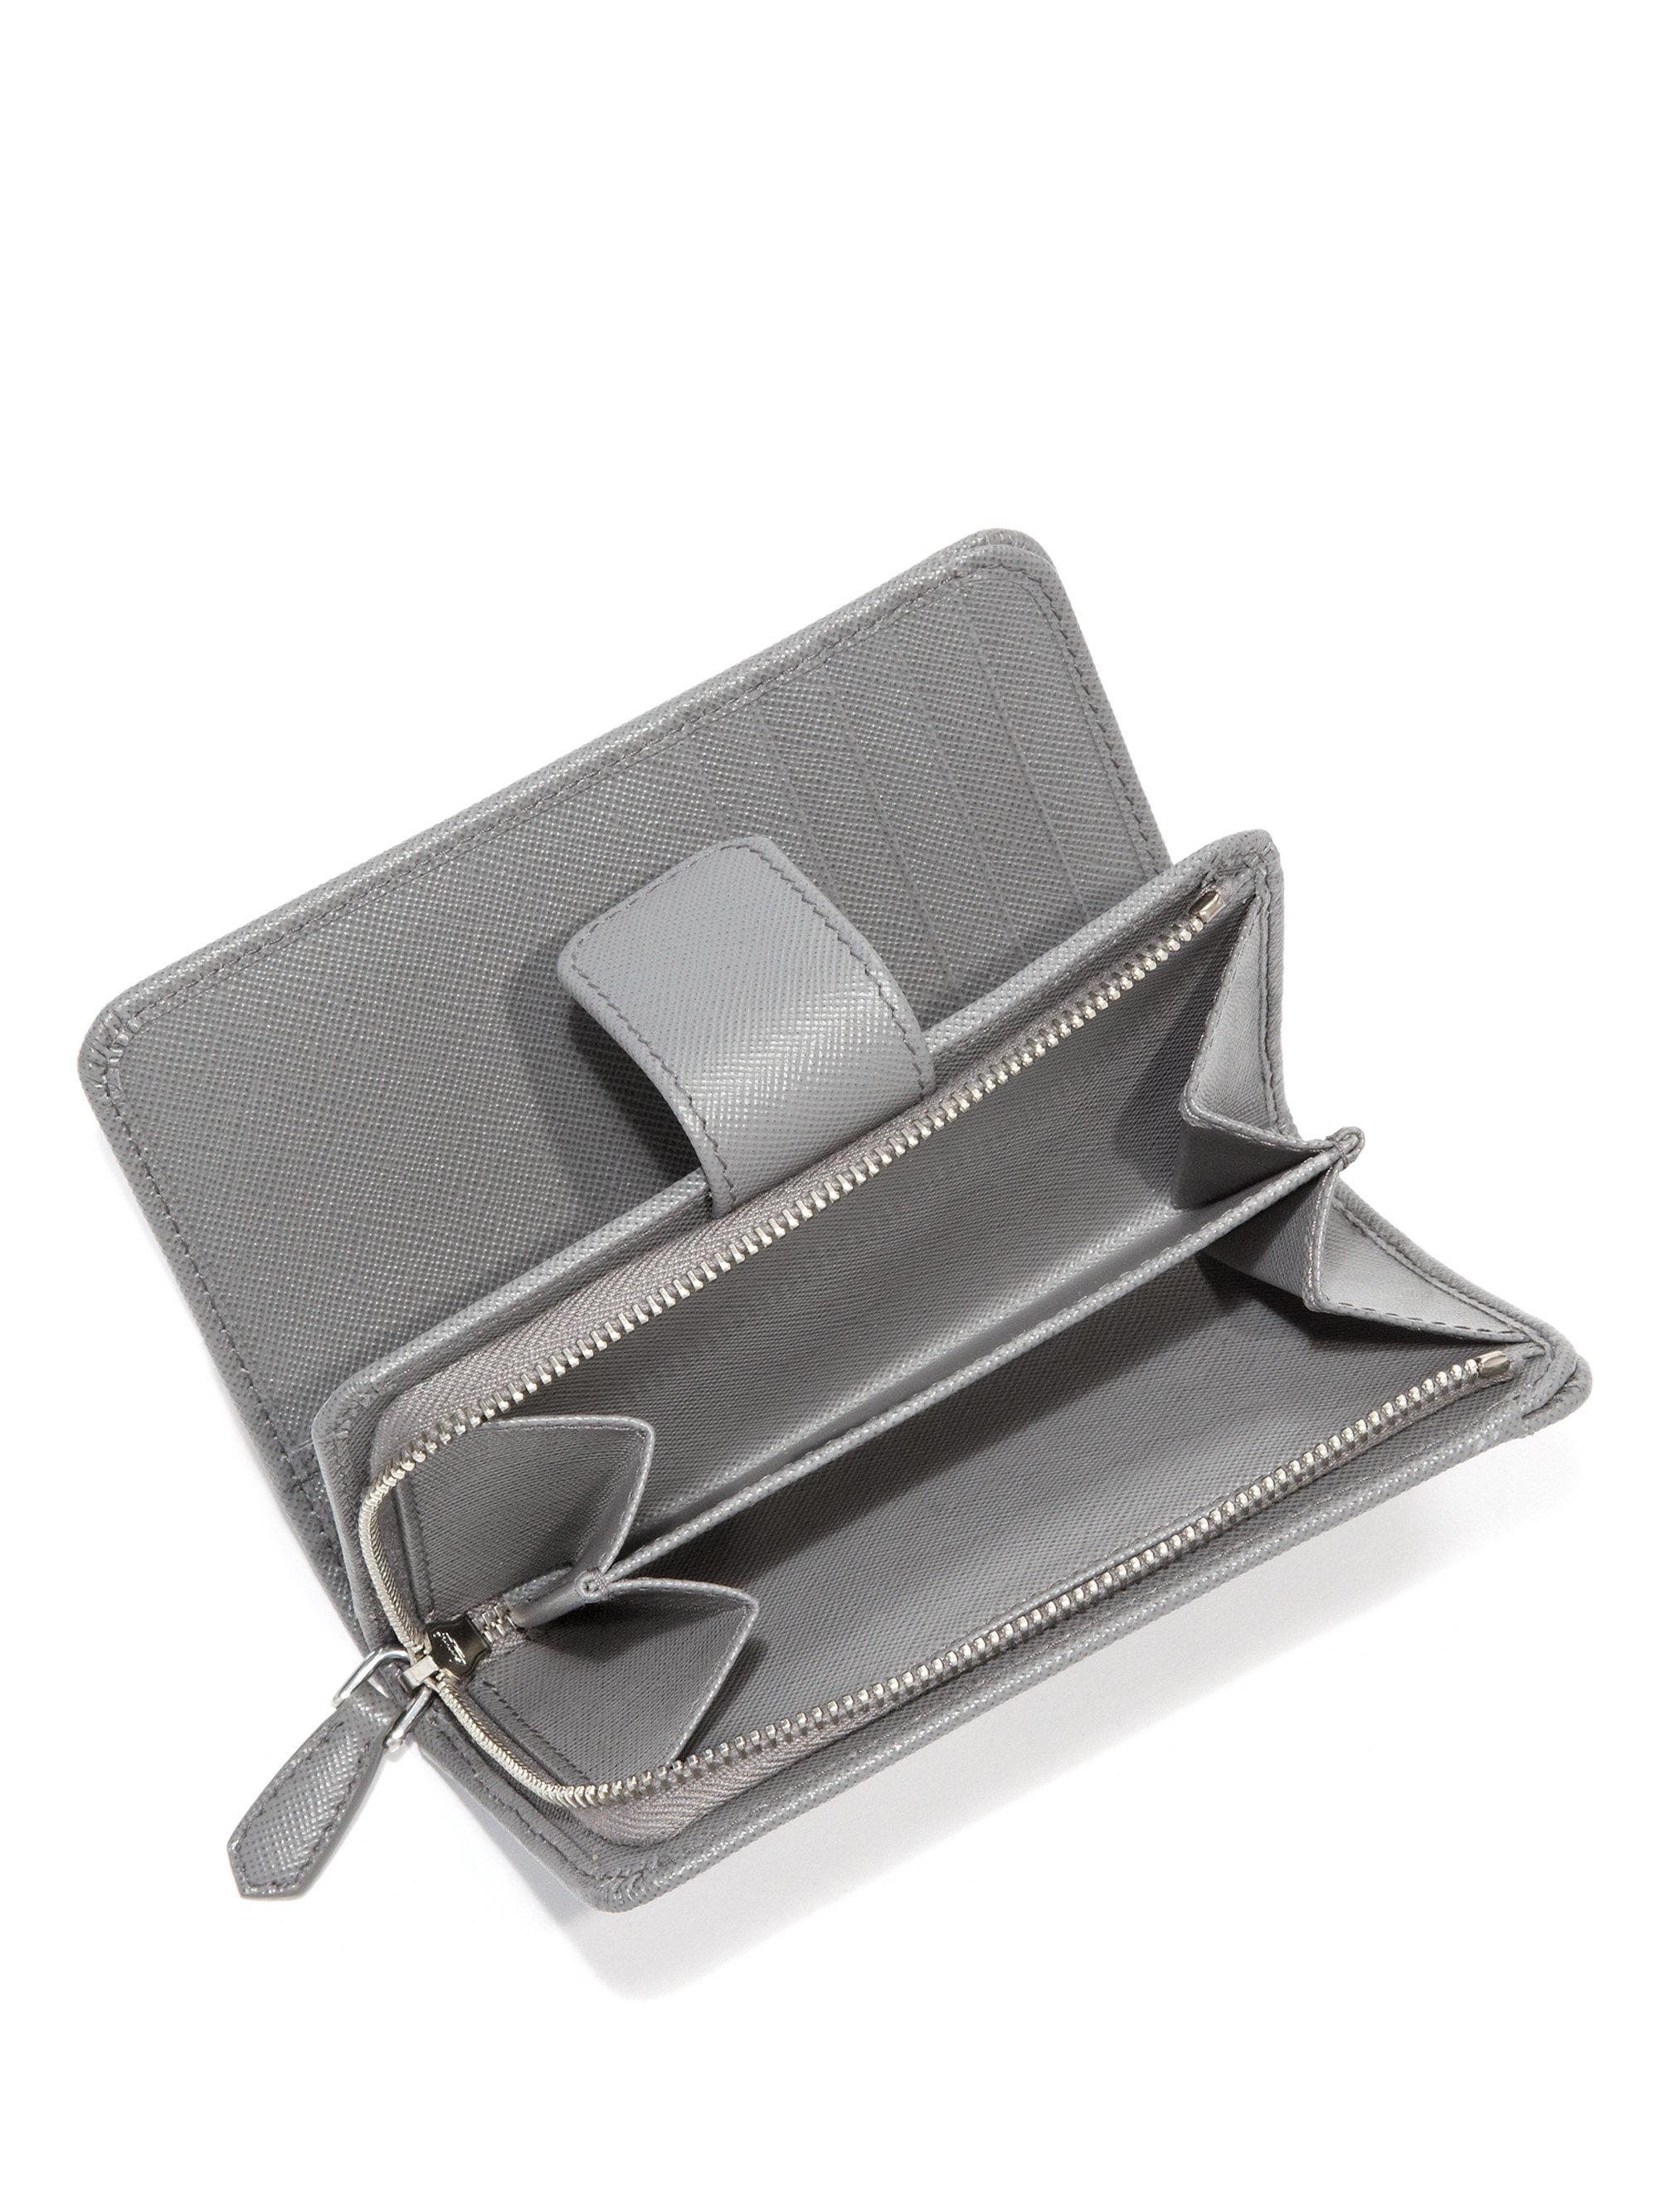 Prada Saffiano Leather Wallet in Gray (grey) | Lyst